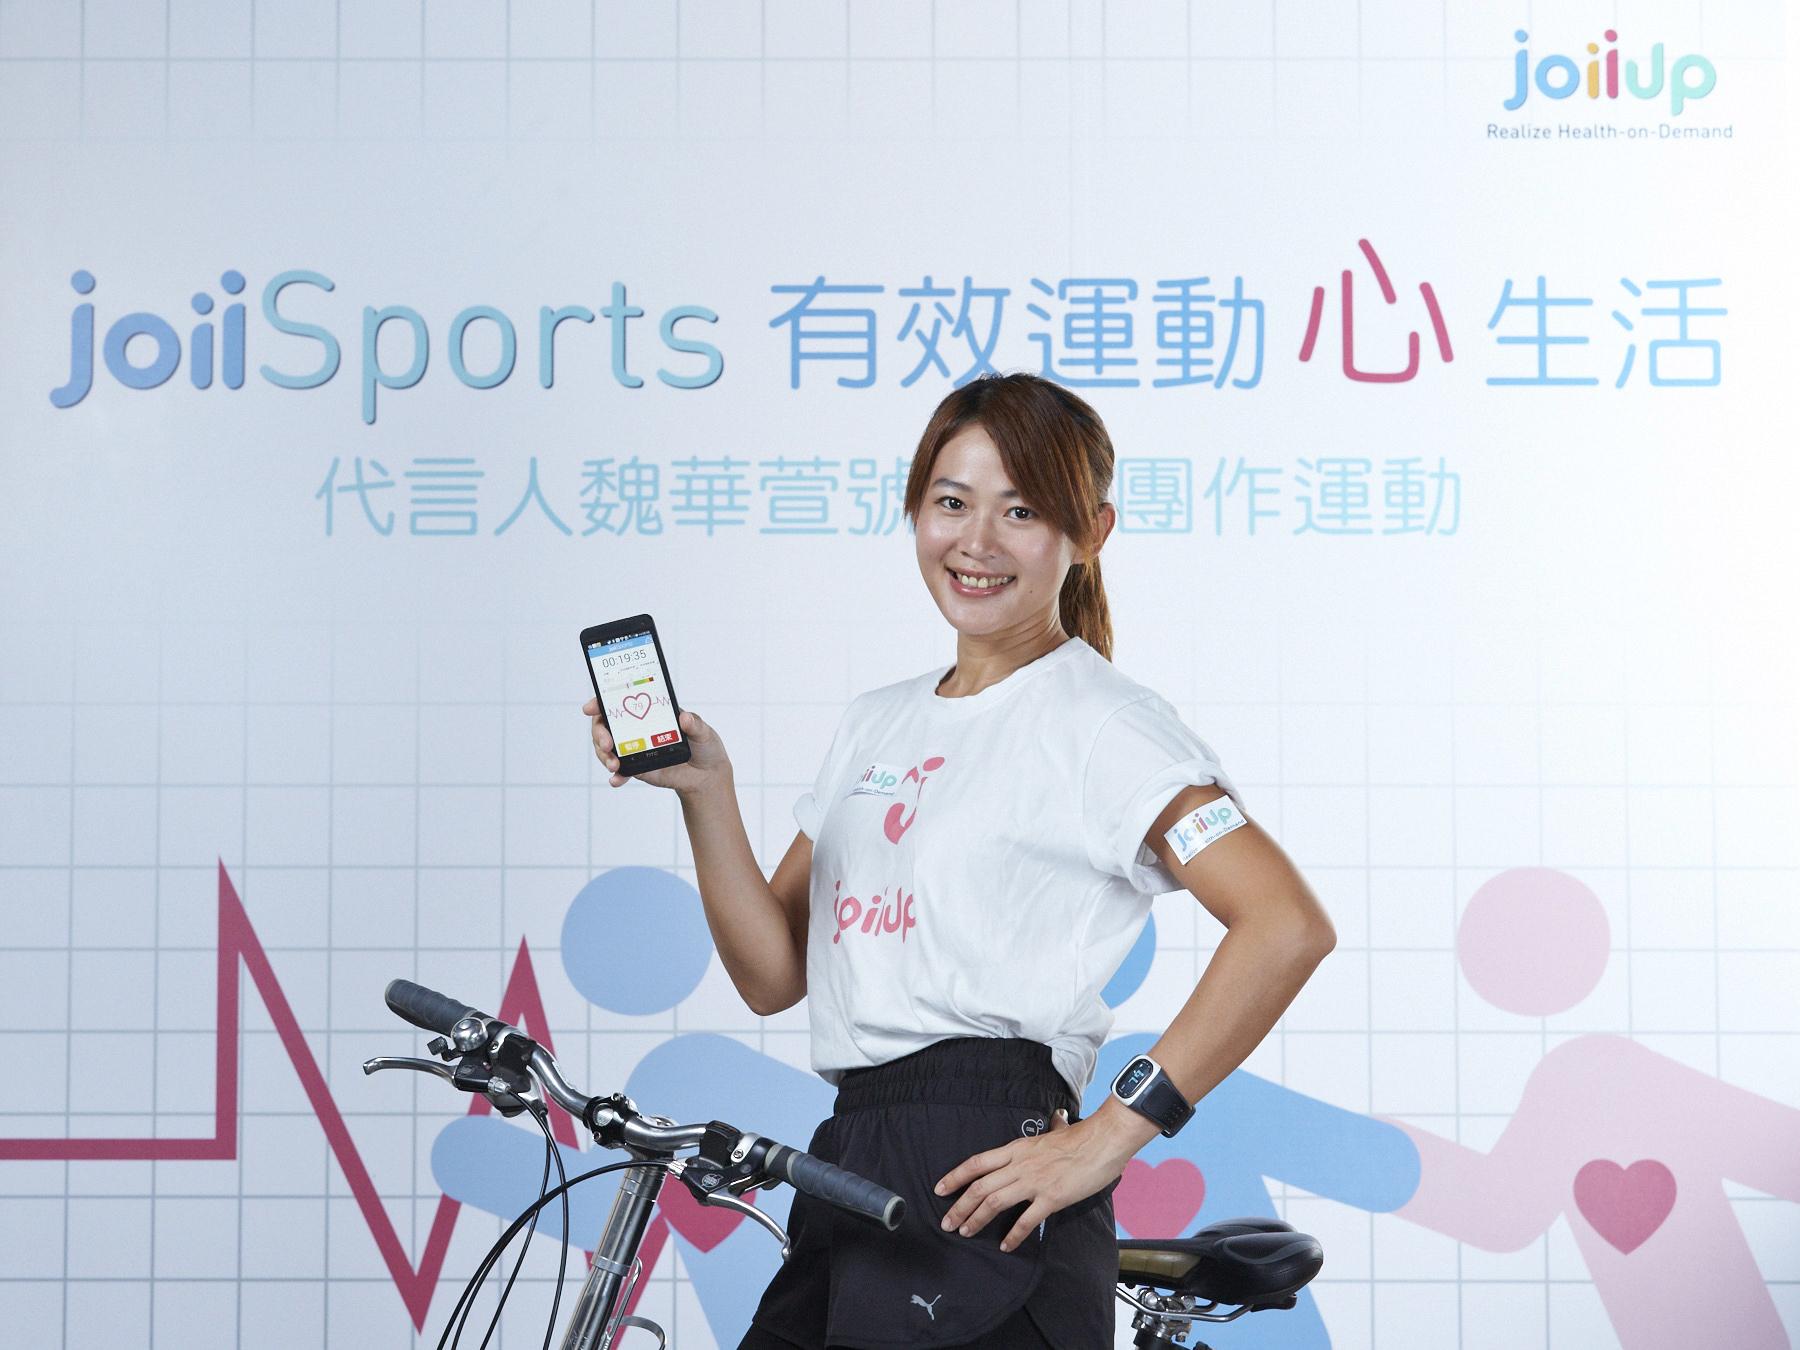 "JoiiUp運動雲 啟動運動""心""風潮,JoiiSports運動管理APP 打造有效、安全、社群娛樂運動島"